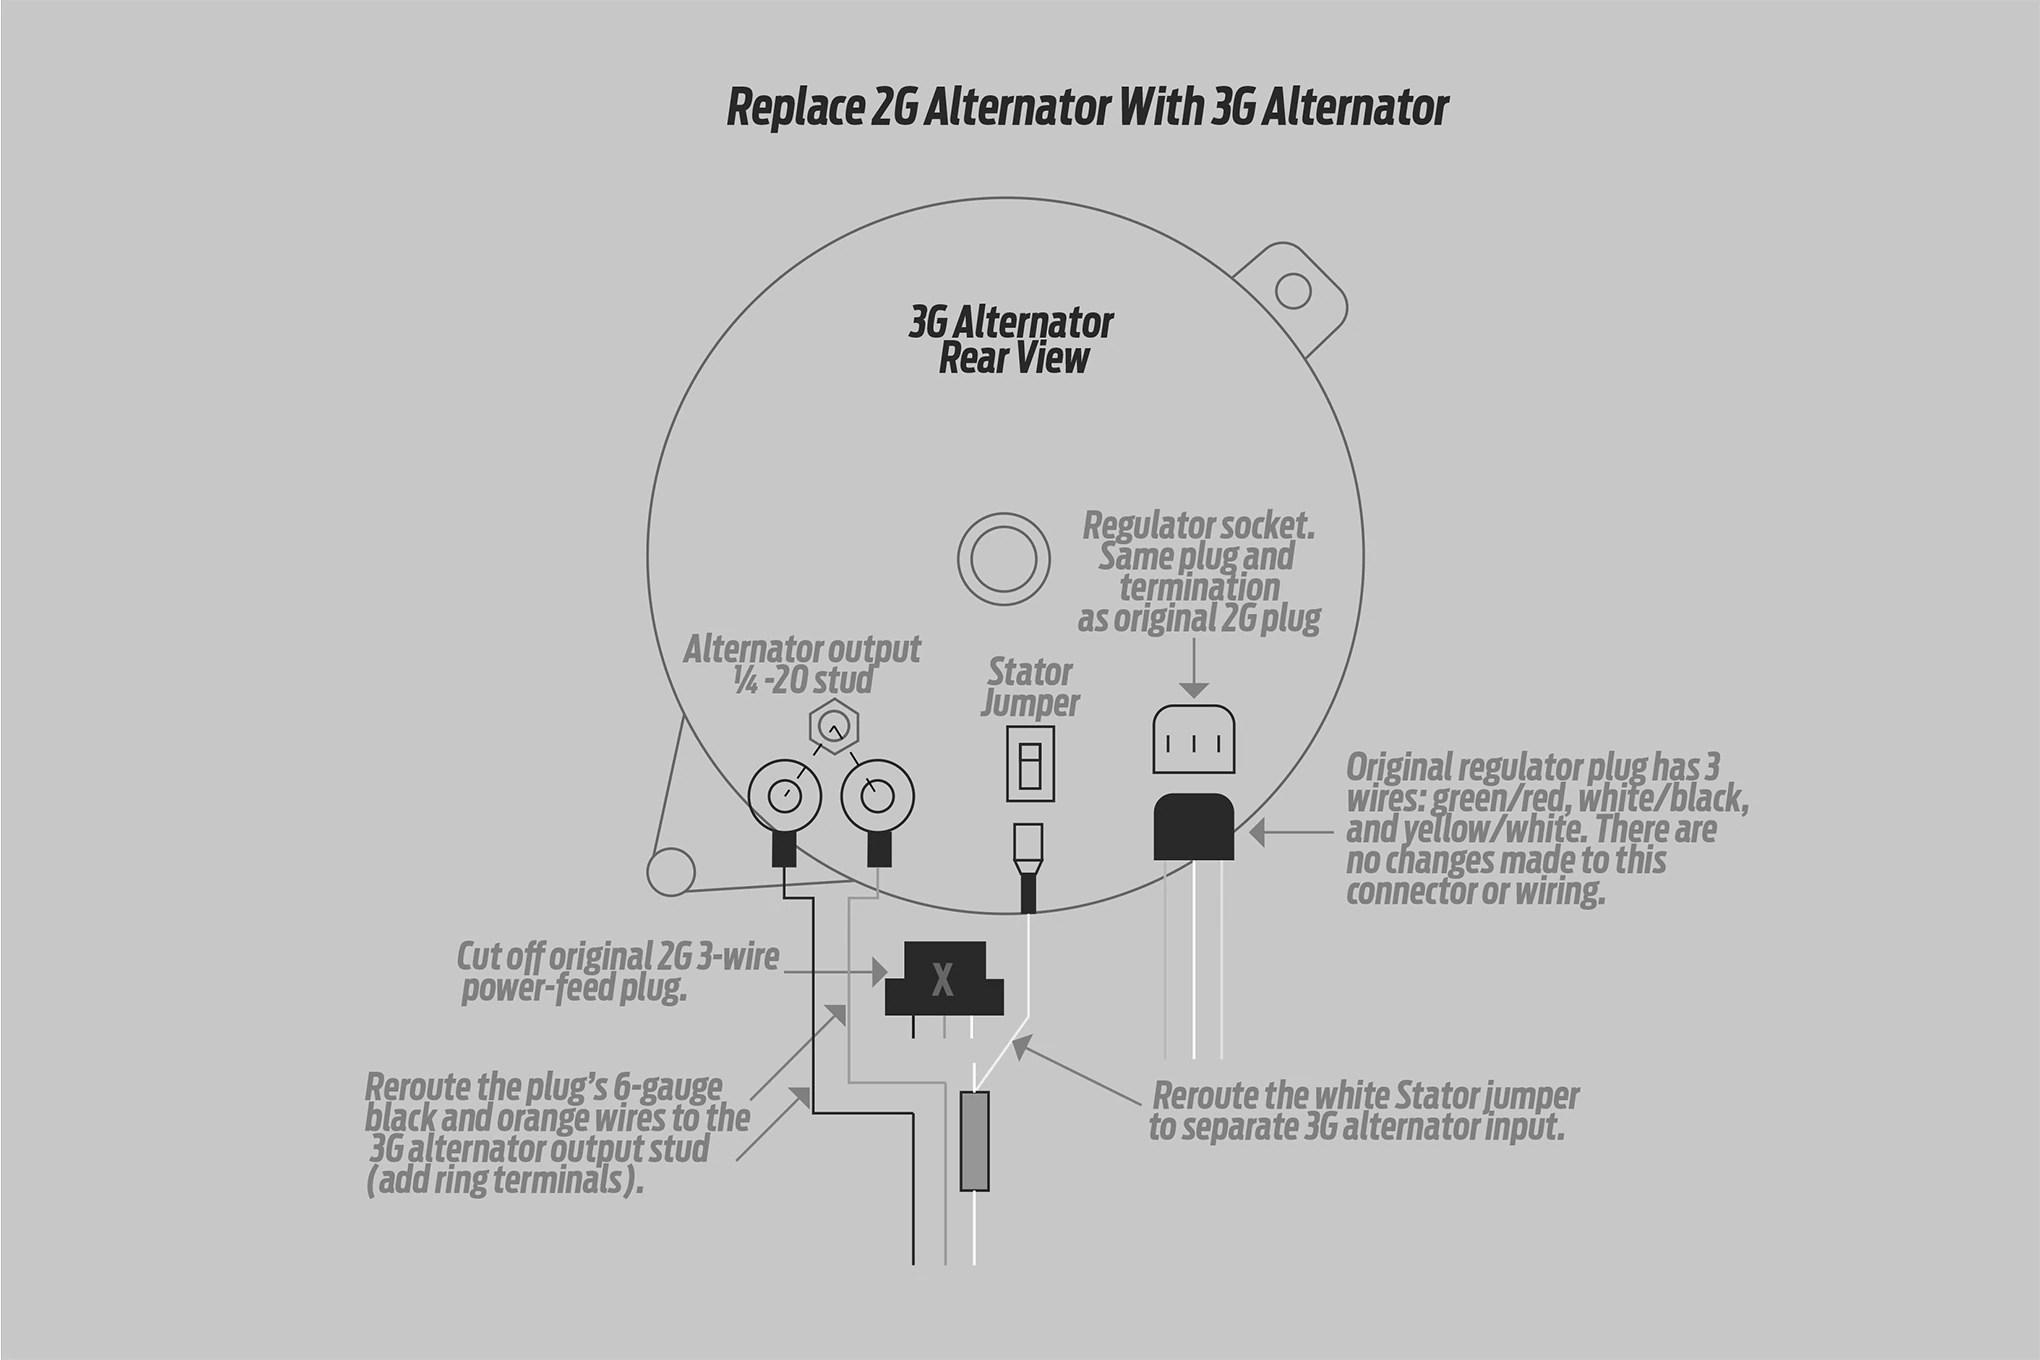 medium resolution of how to install a high output ford 3g alternator into older fords alternator wiring diagram rear shut off